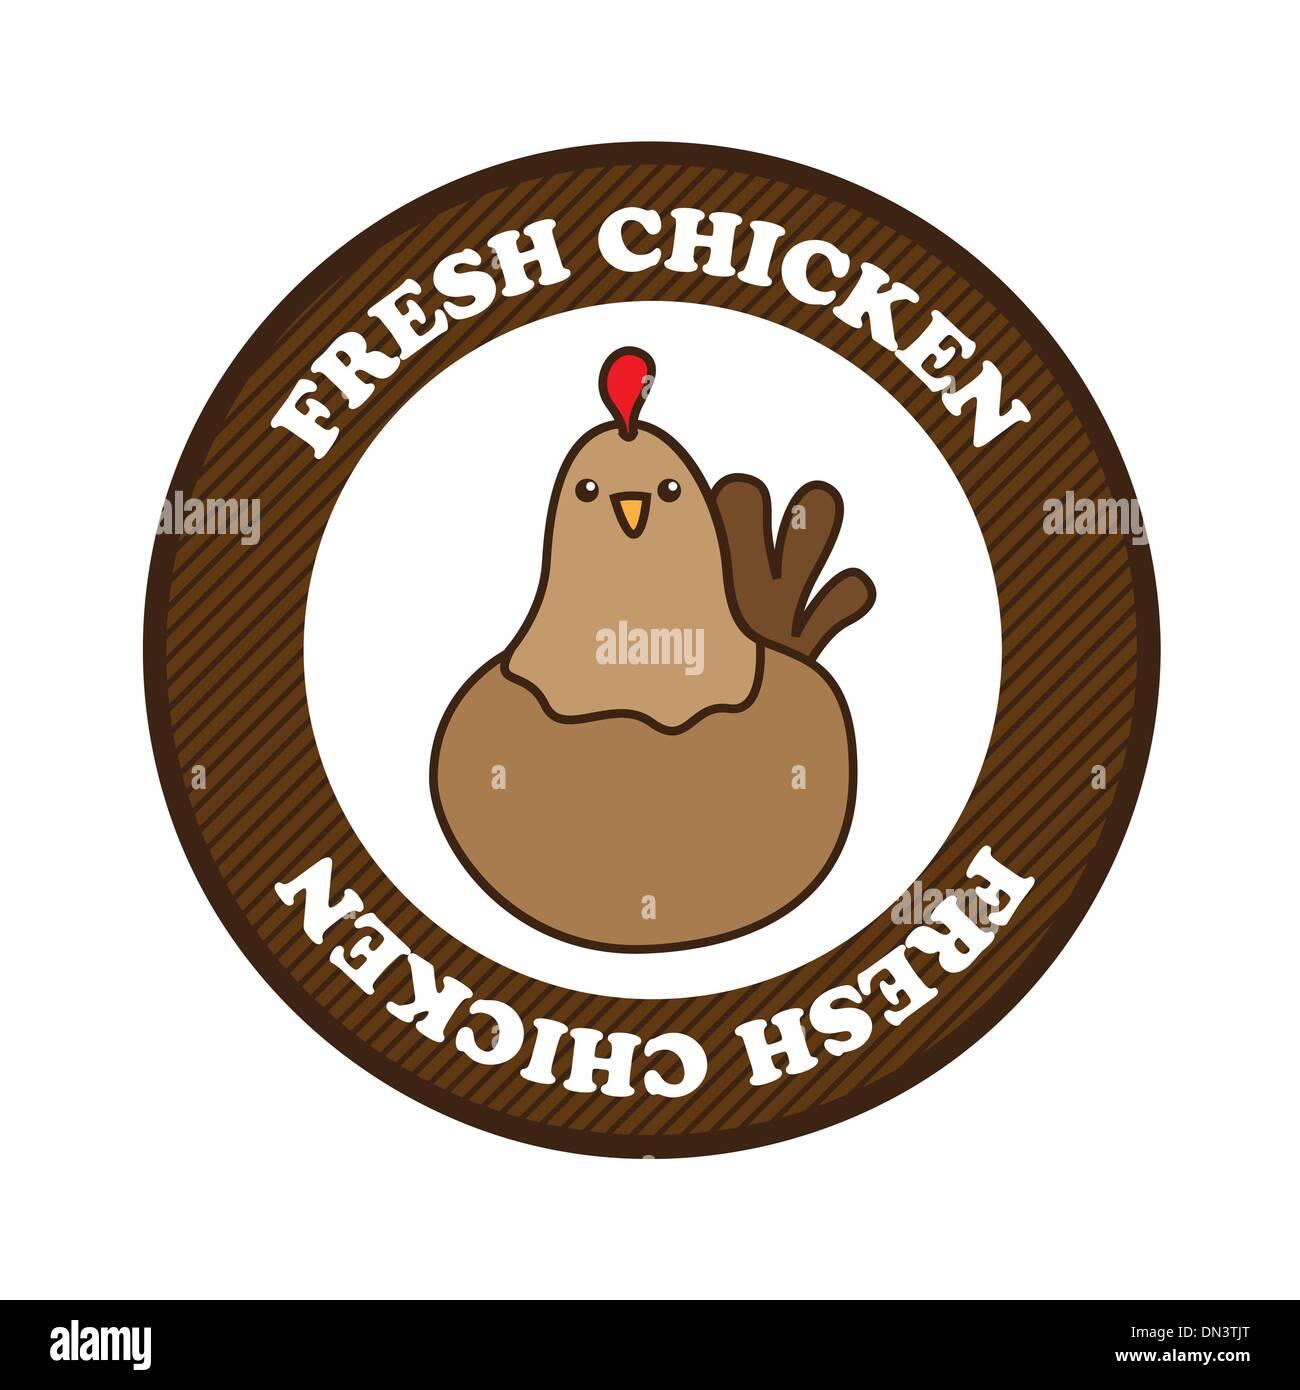 fresh chicken - Stock Vector